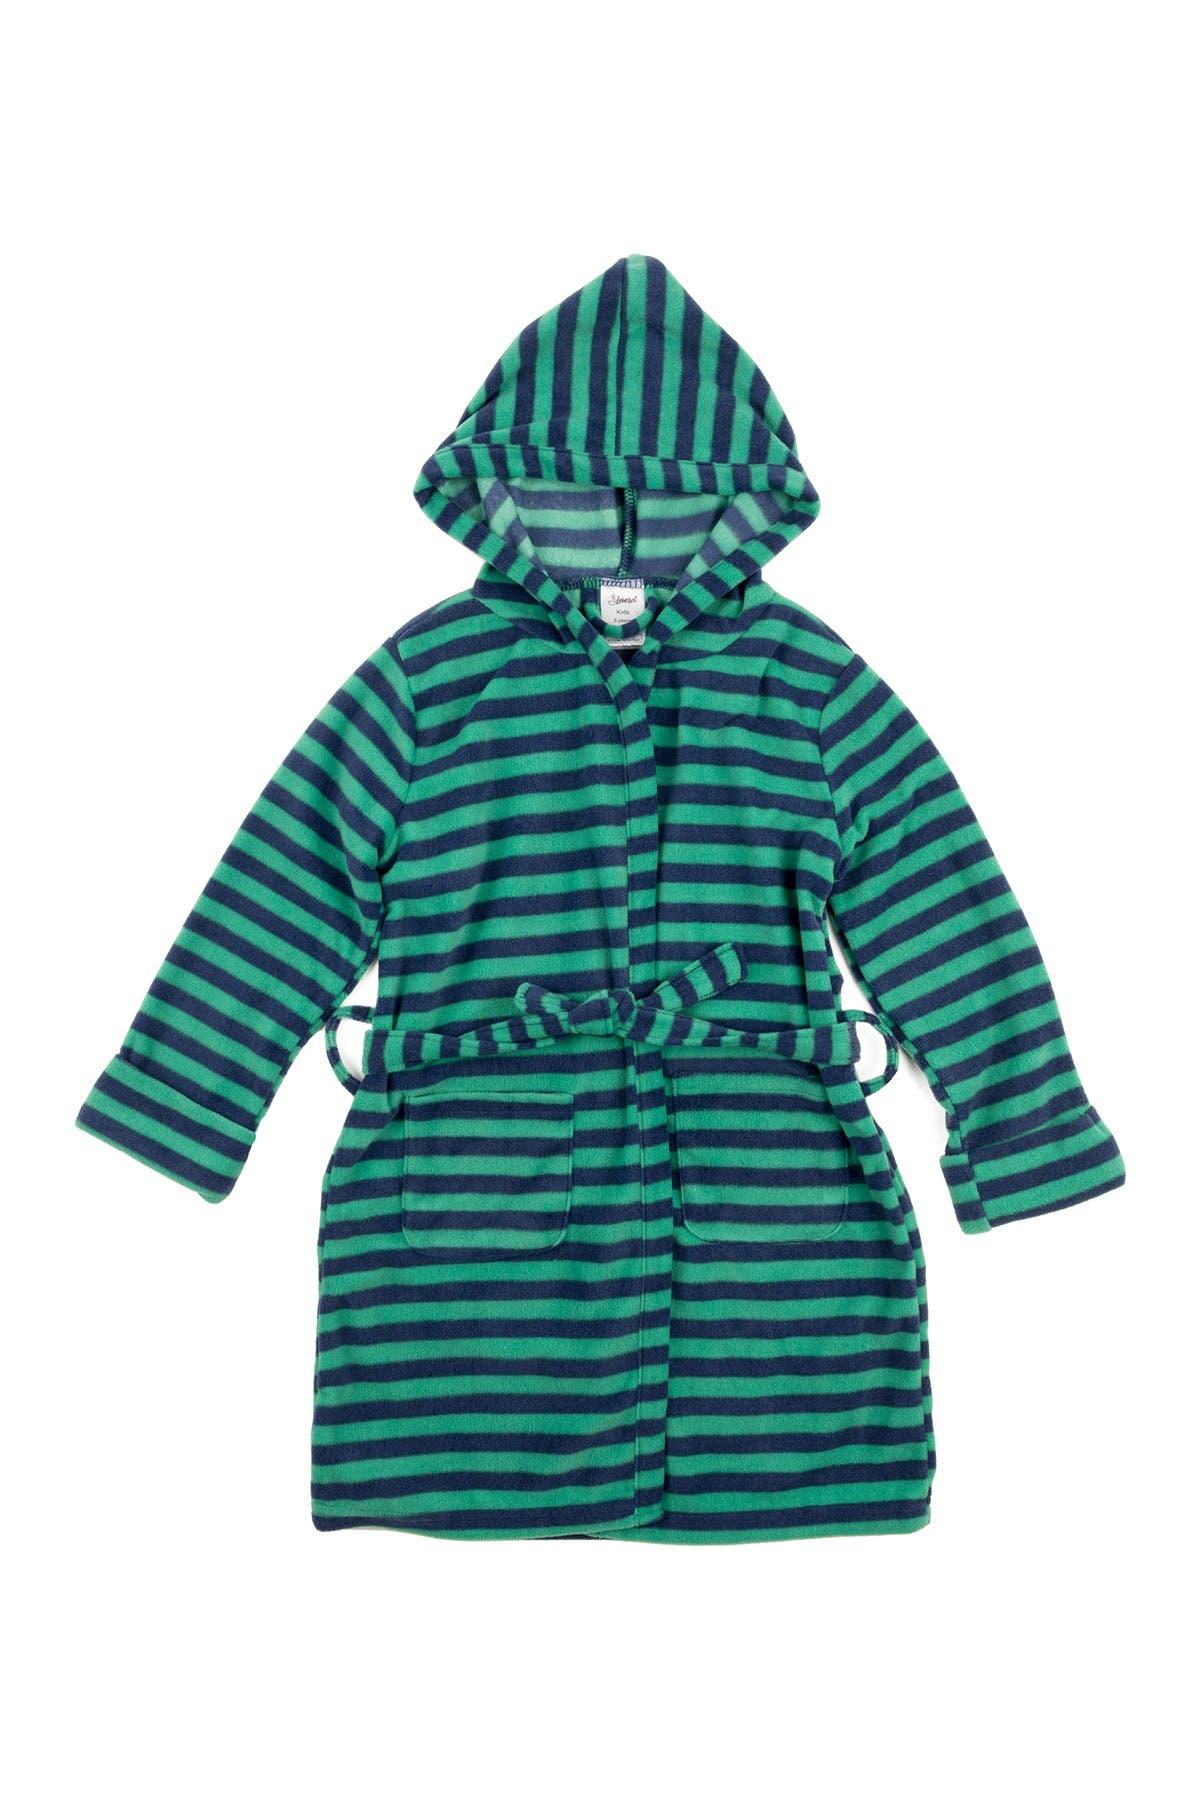 Image of Leveret Blue and Green Stripes Kids Fleece Robe